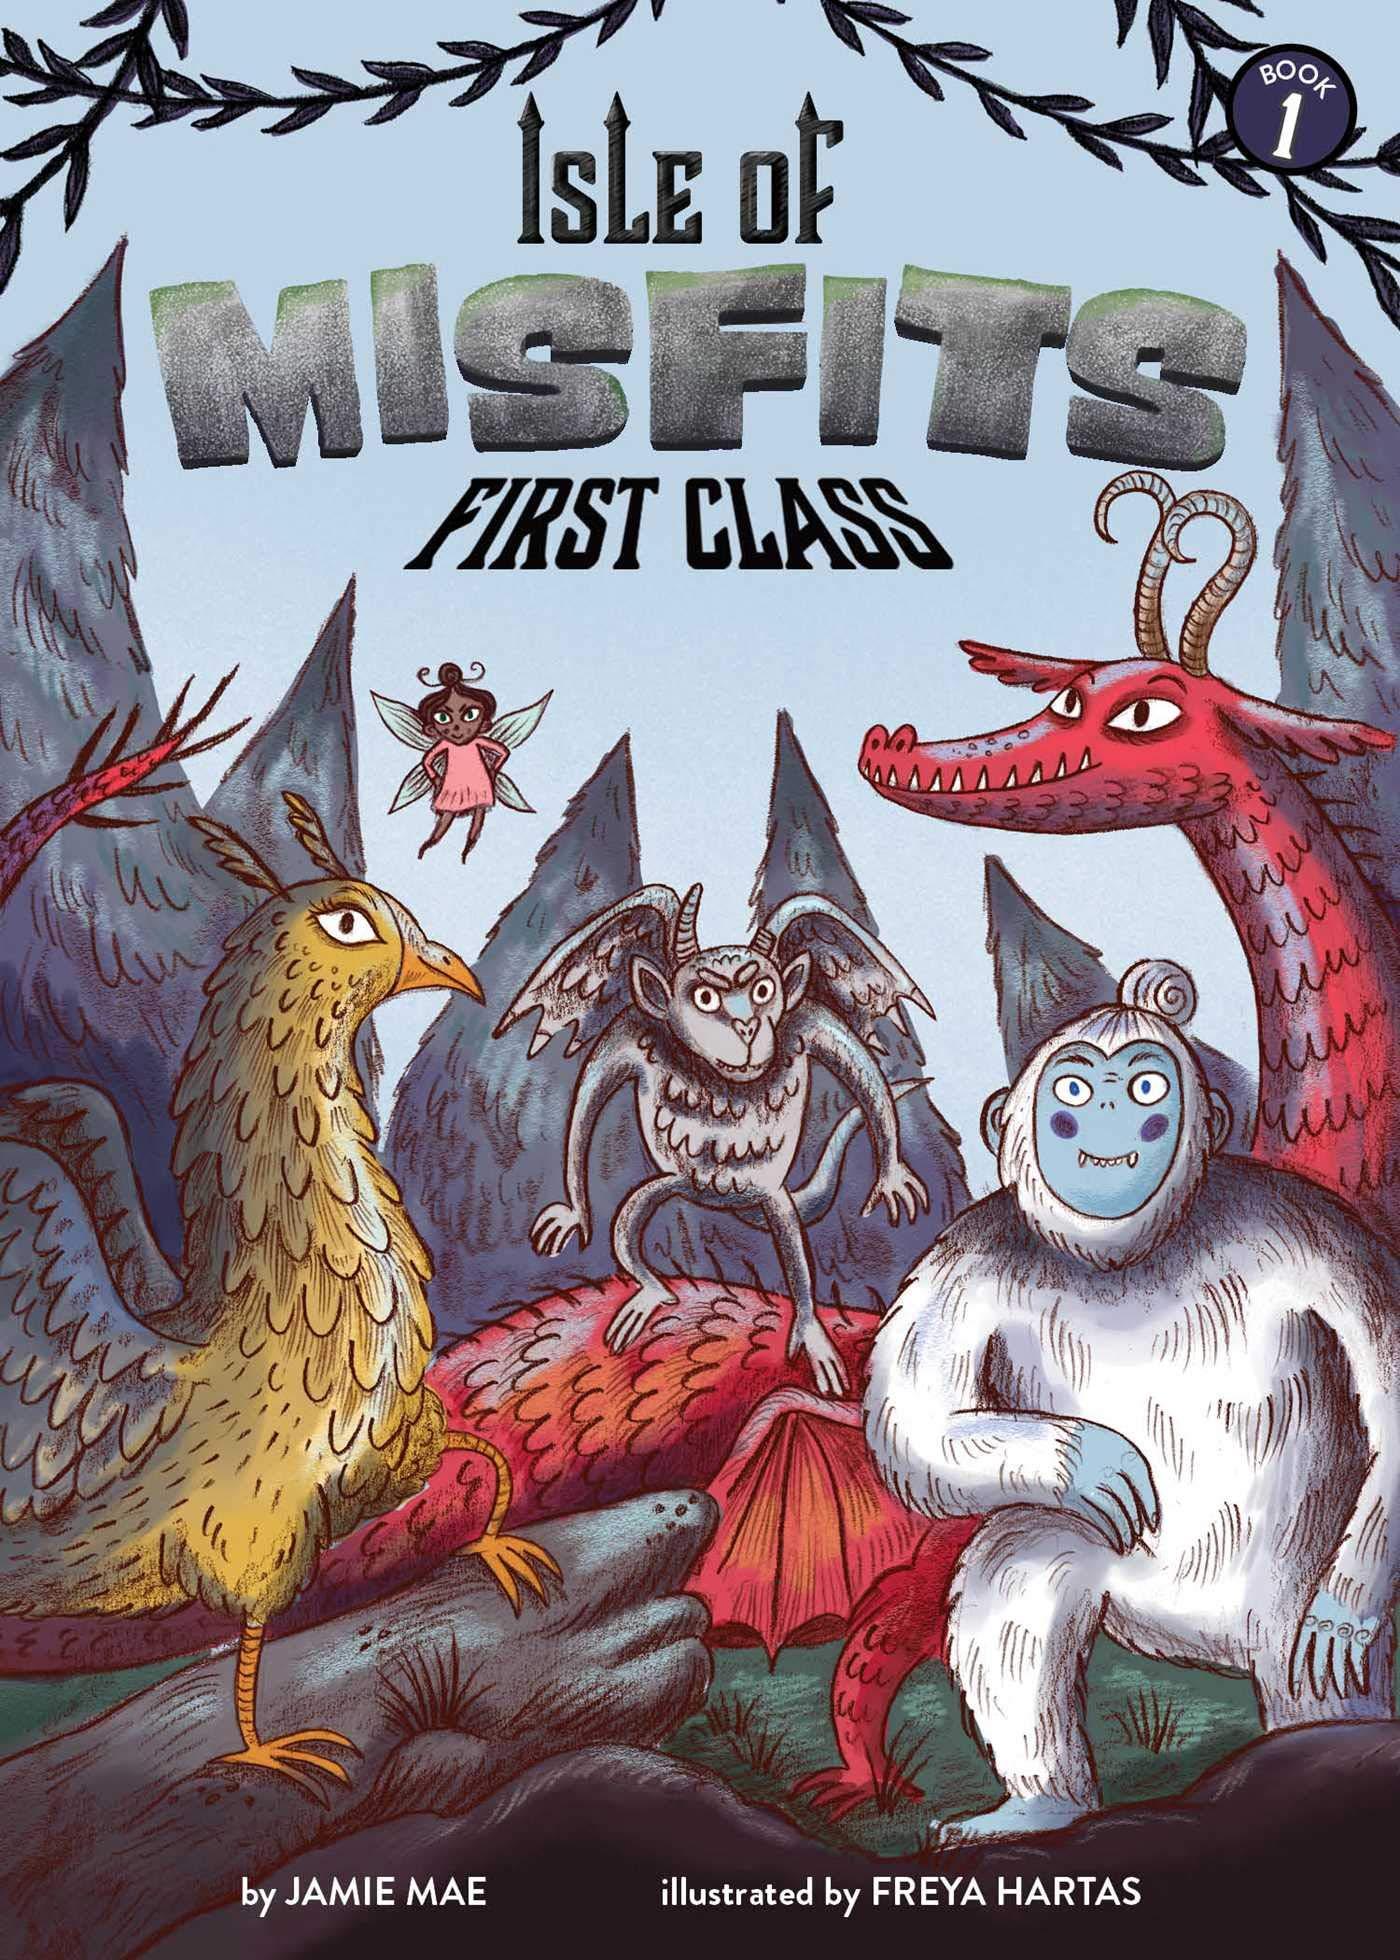 Amazon.com: Isle of Misfits 1: First Class (9781499808216): Mae, Jamie, Hartas, Freya: Books